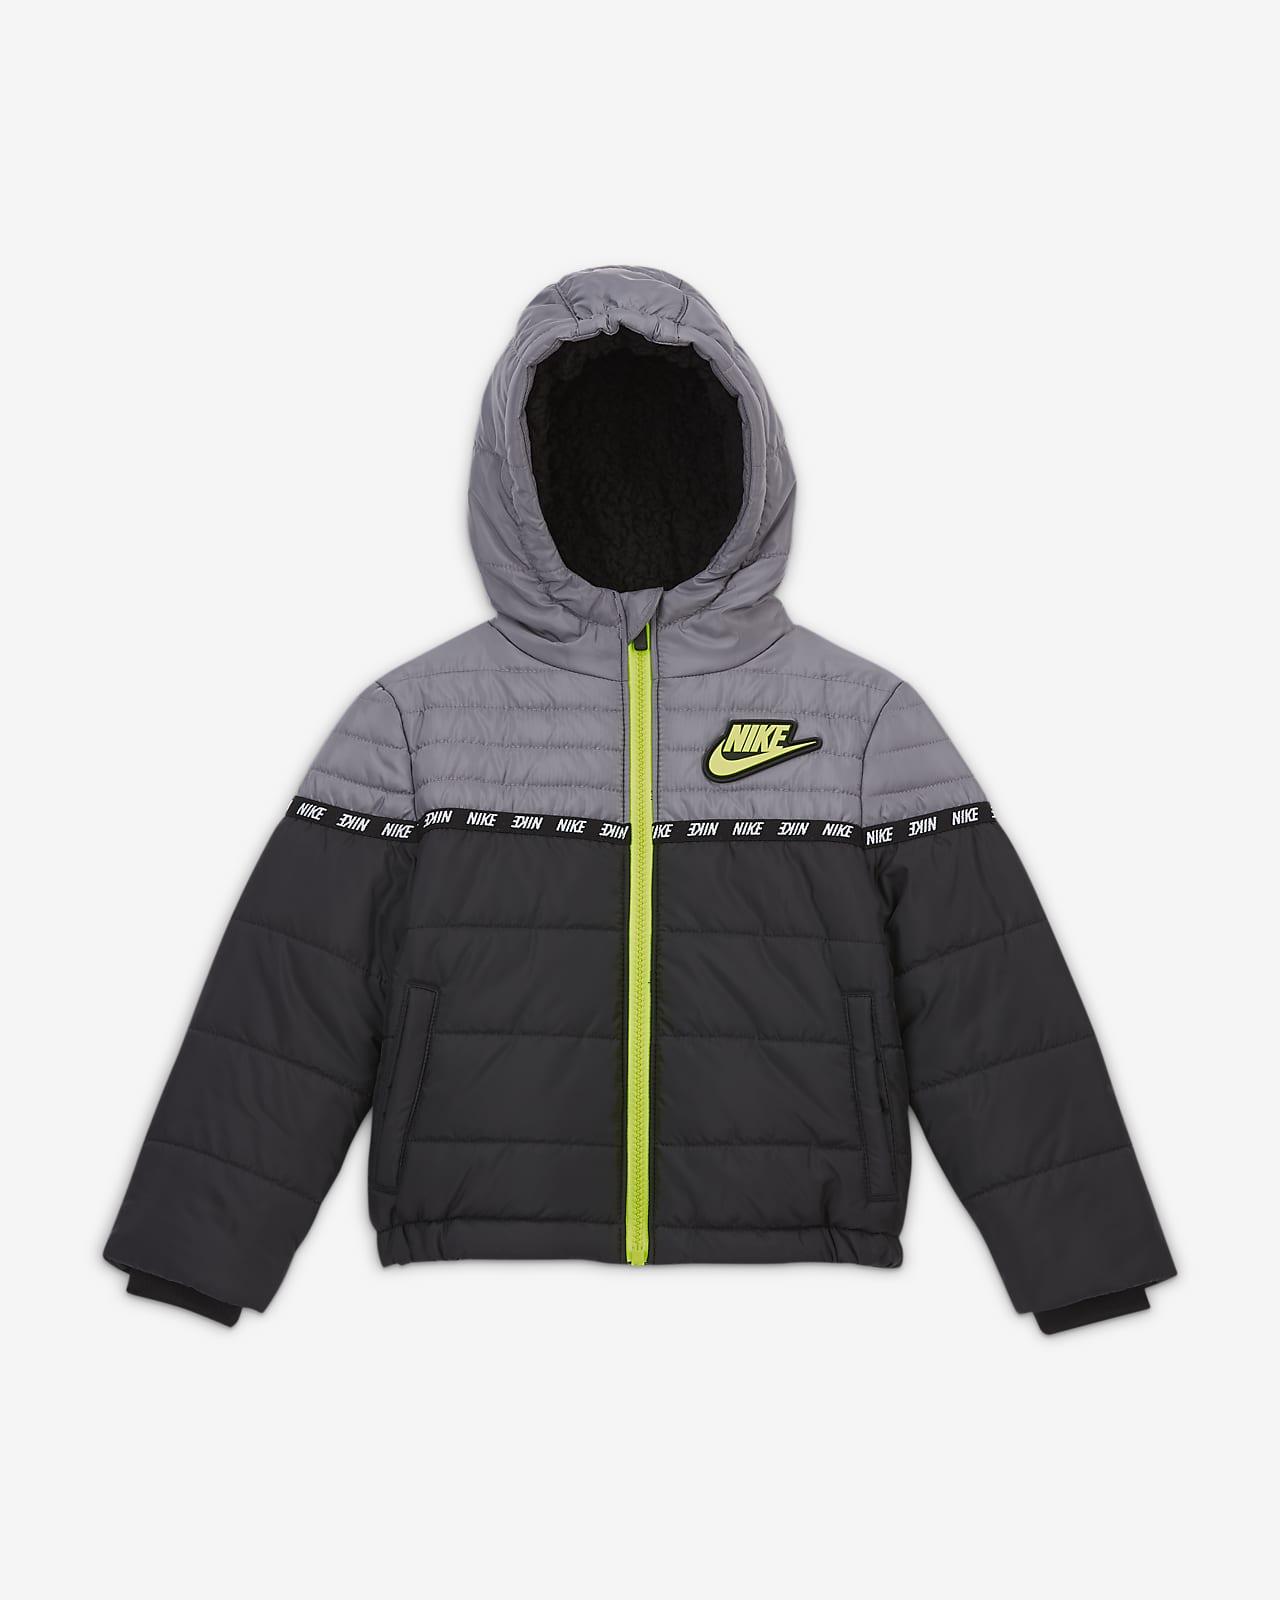 Nike Sportswear Chaqueta acolchada con relleno sintético